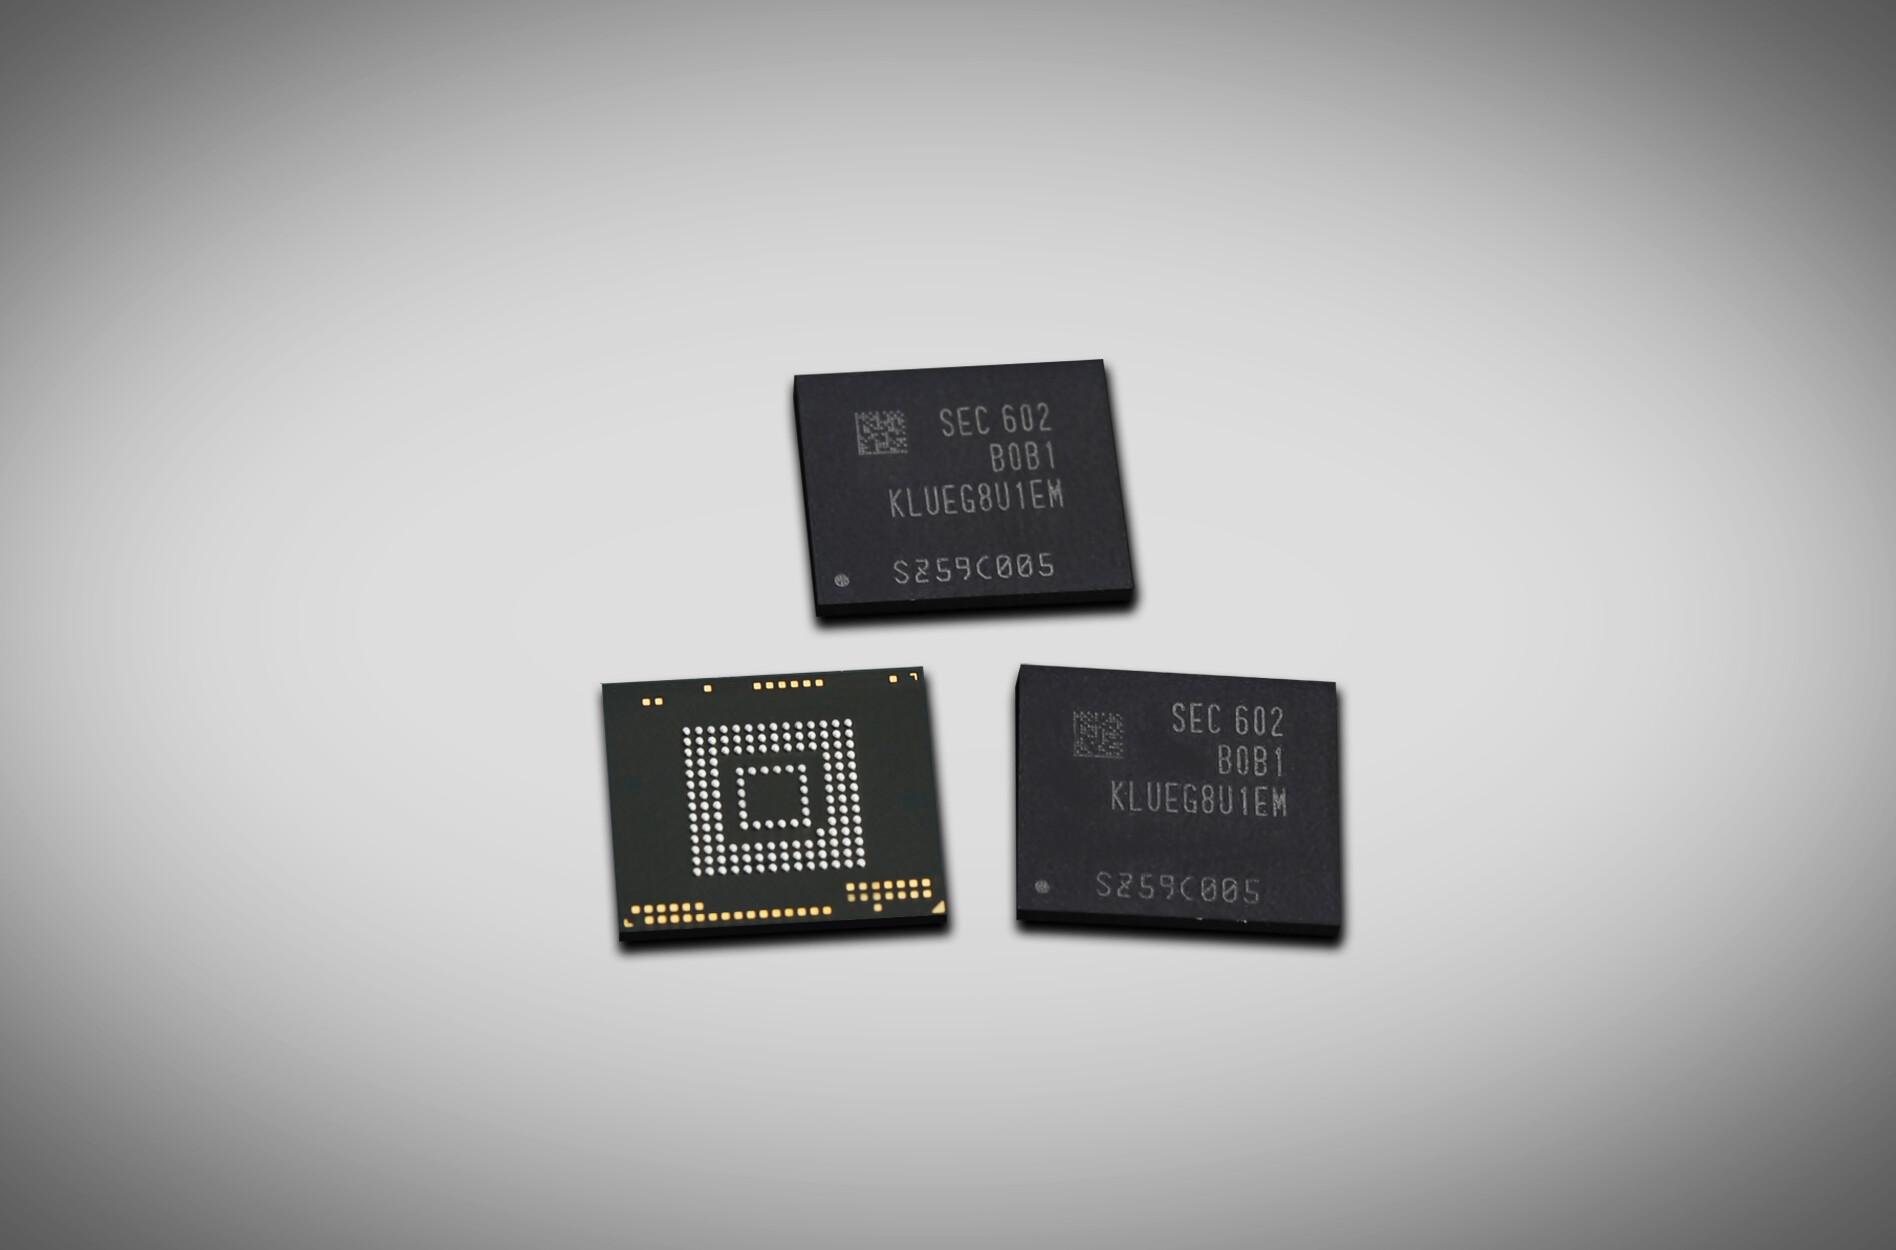 Samsung introduces blazing-fast 256GB UFS 2.0 memory chip ...